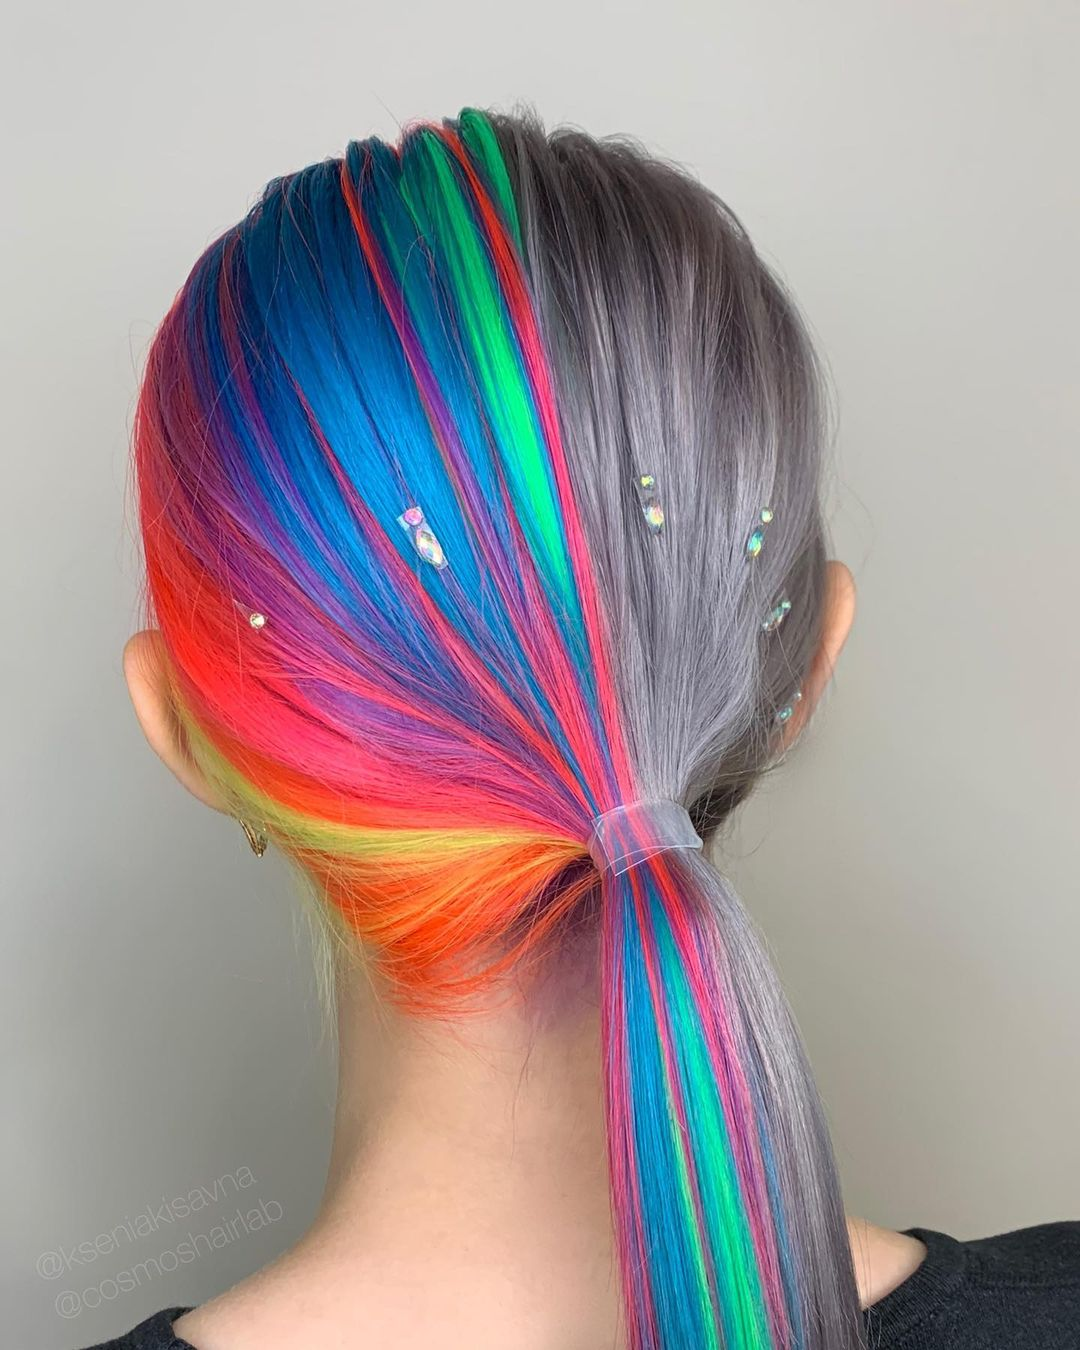 cabello de varios colores